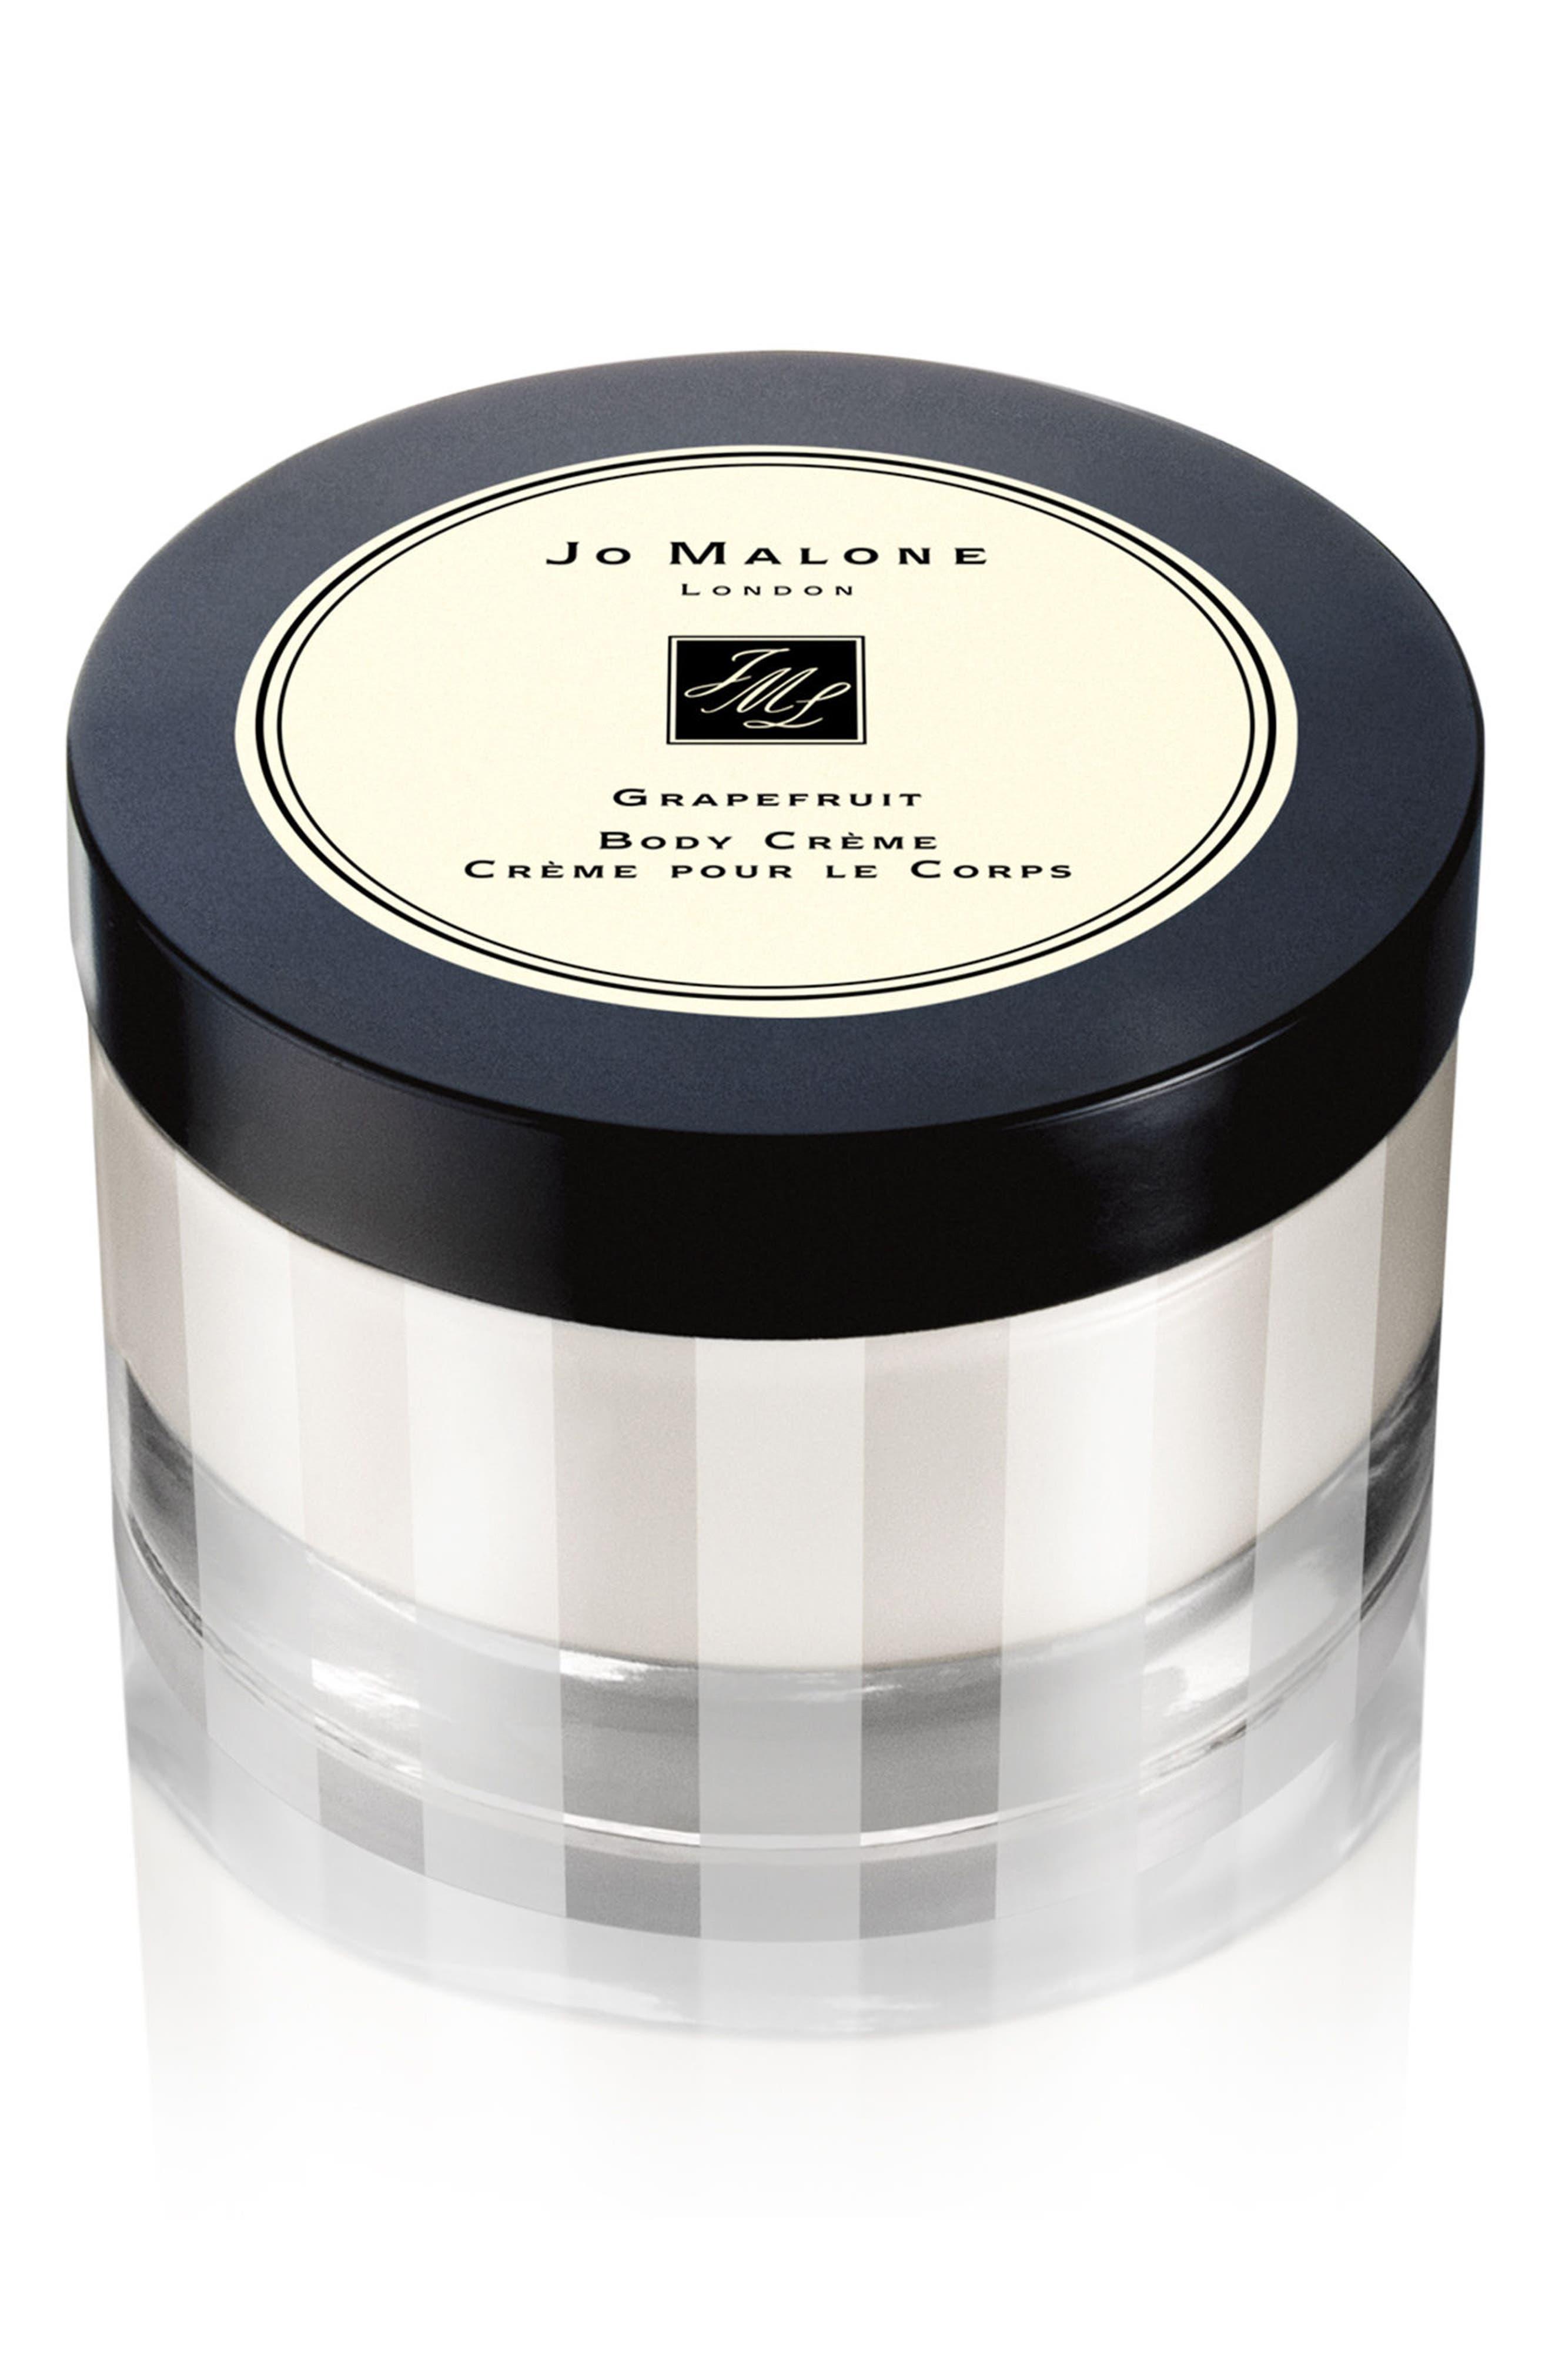 Jo Malone London™ Grapefruit Body Crème